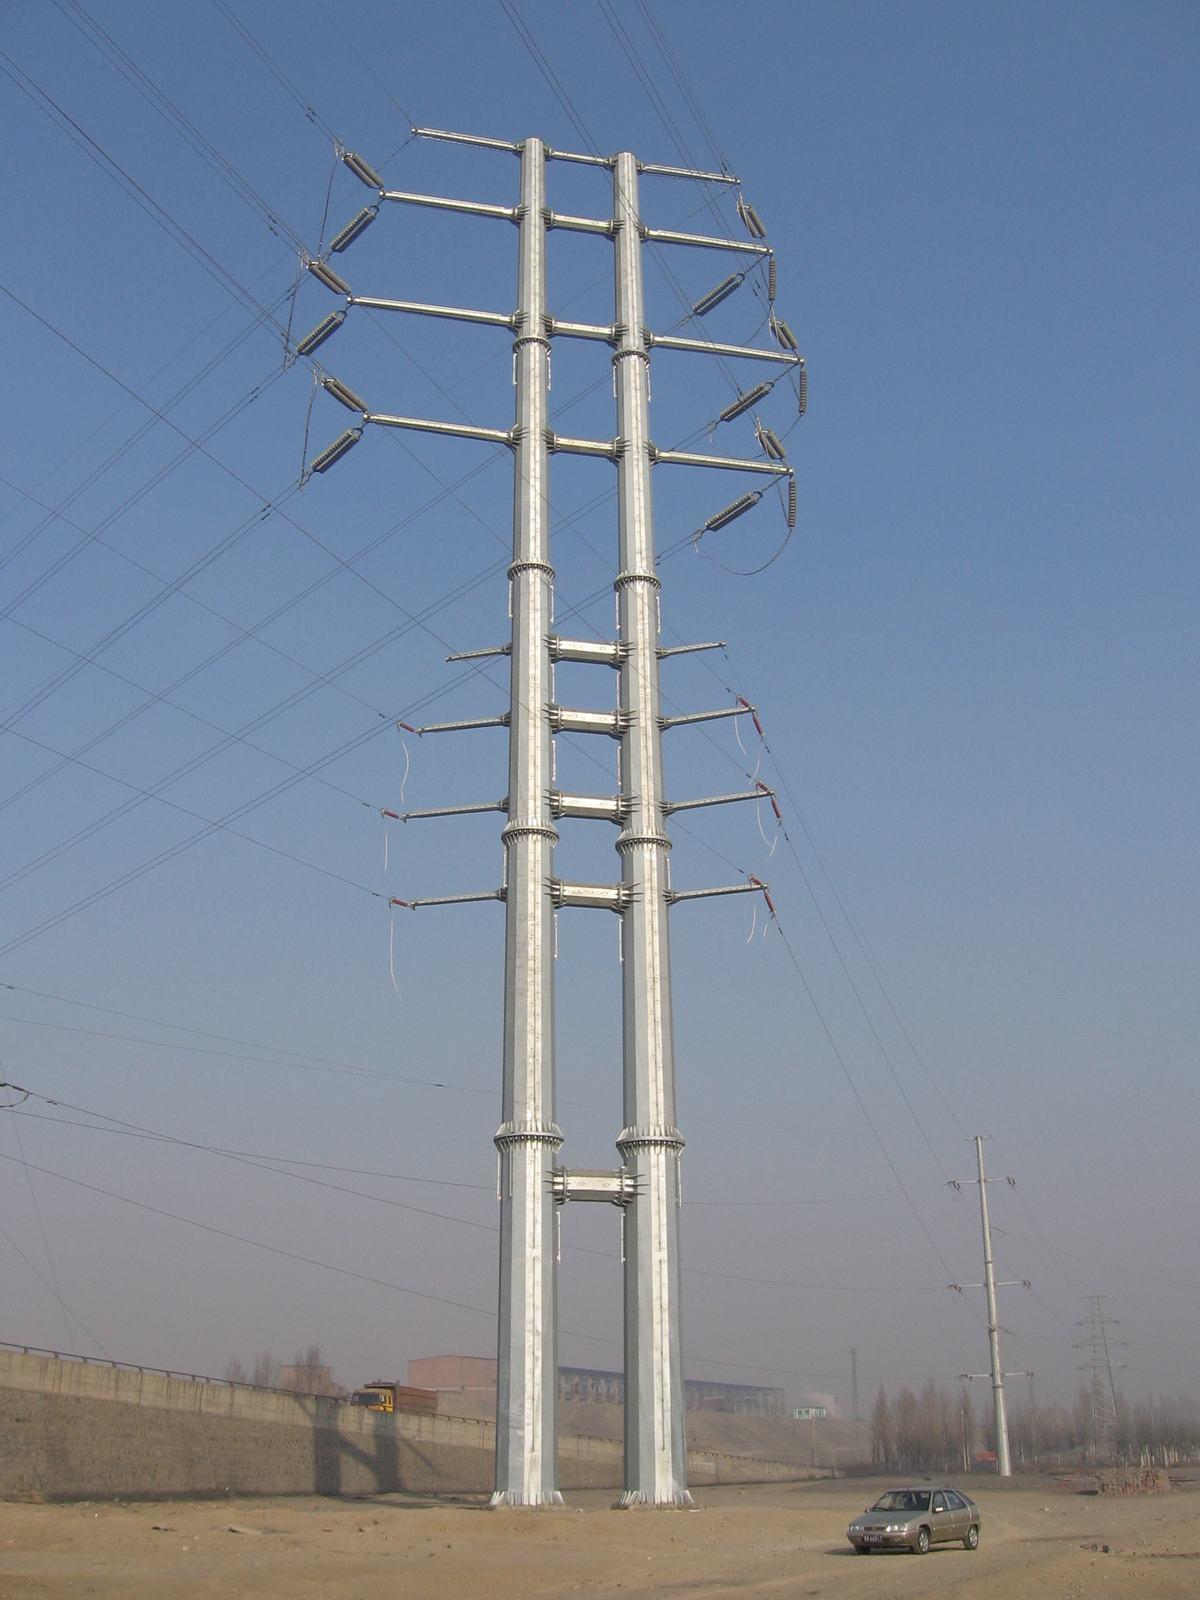 Electricity Transmission&Distribution Poles